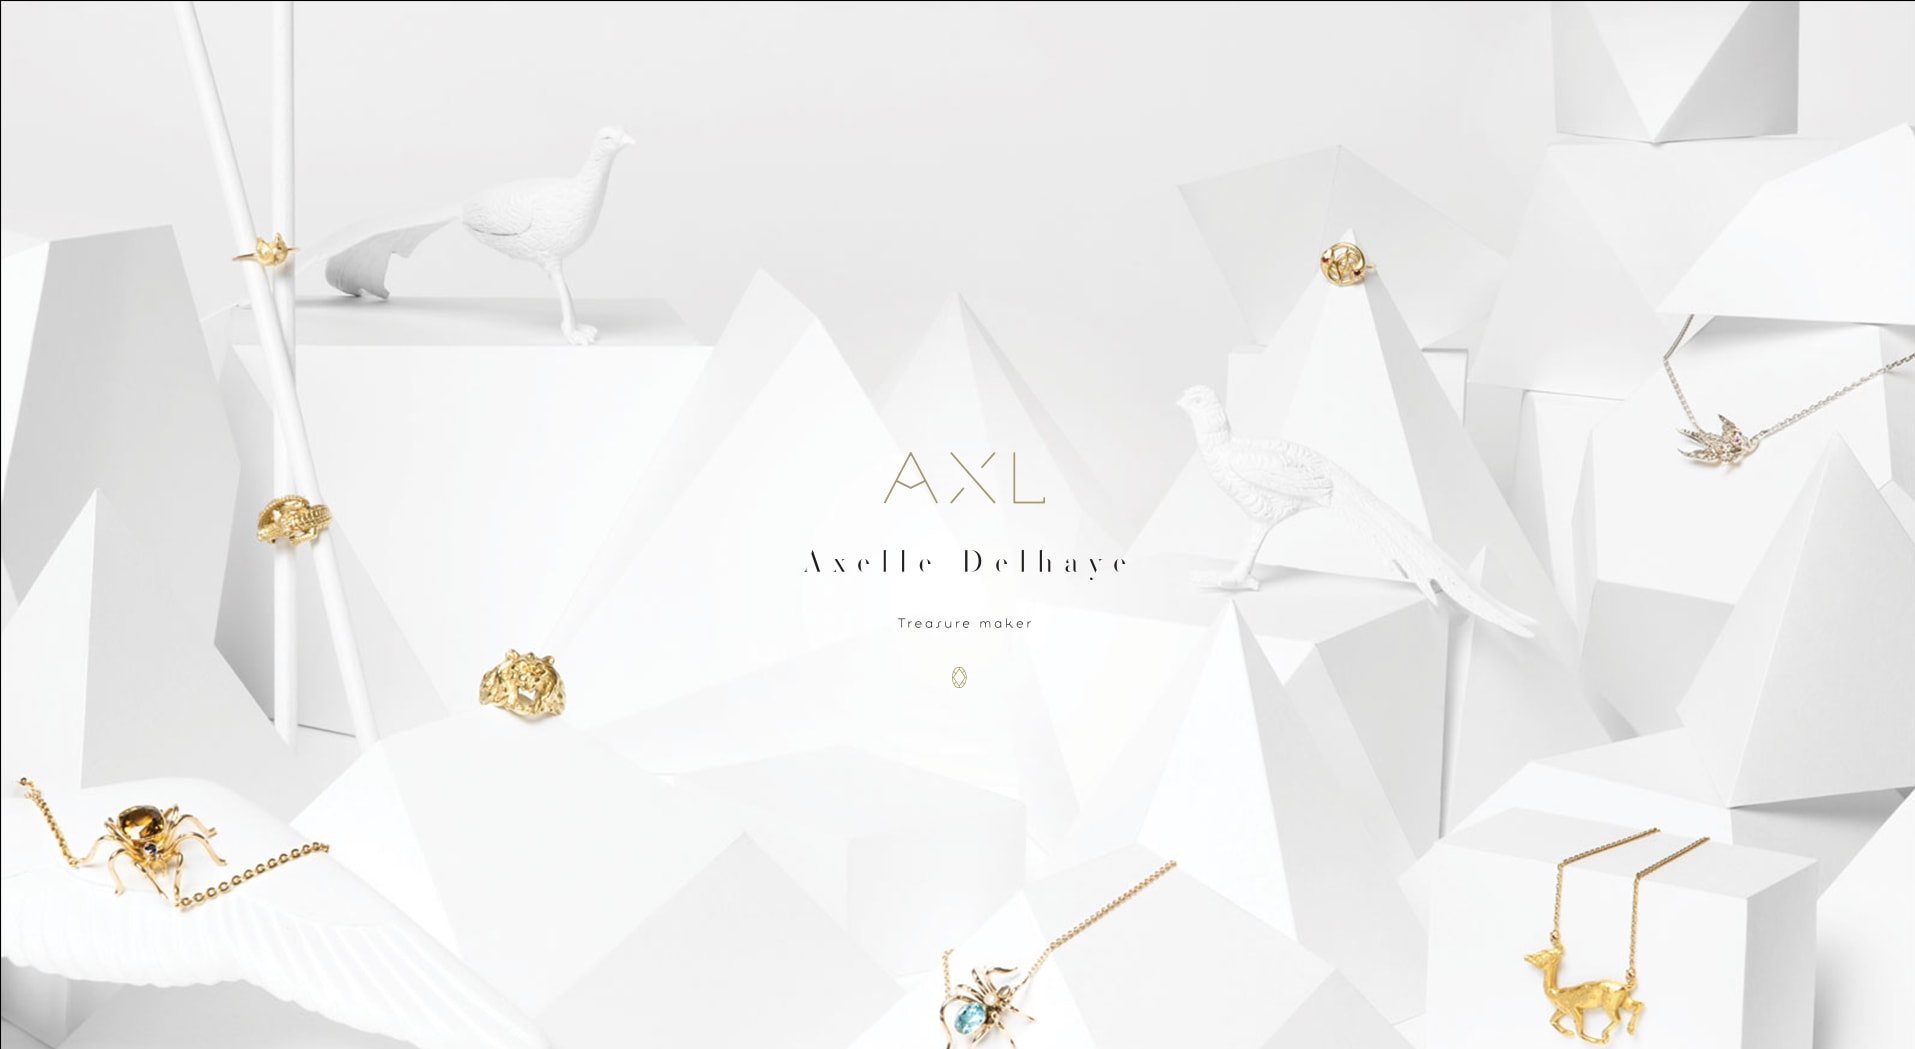 Atelier Design AXL Jewelry